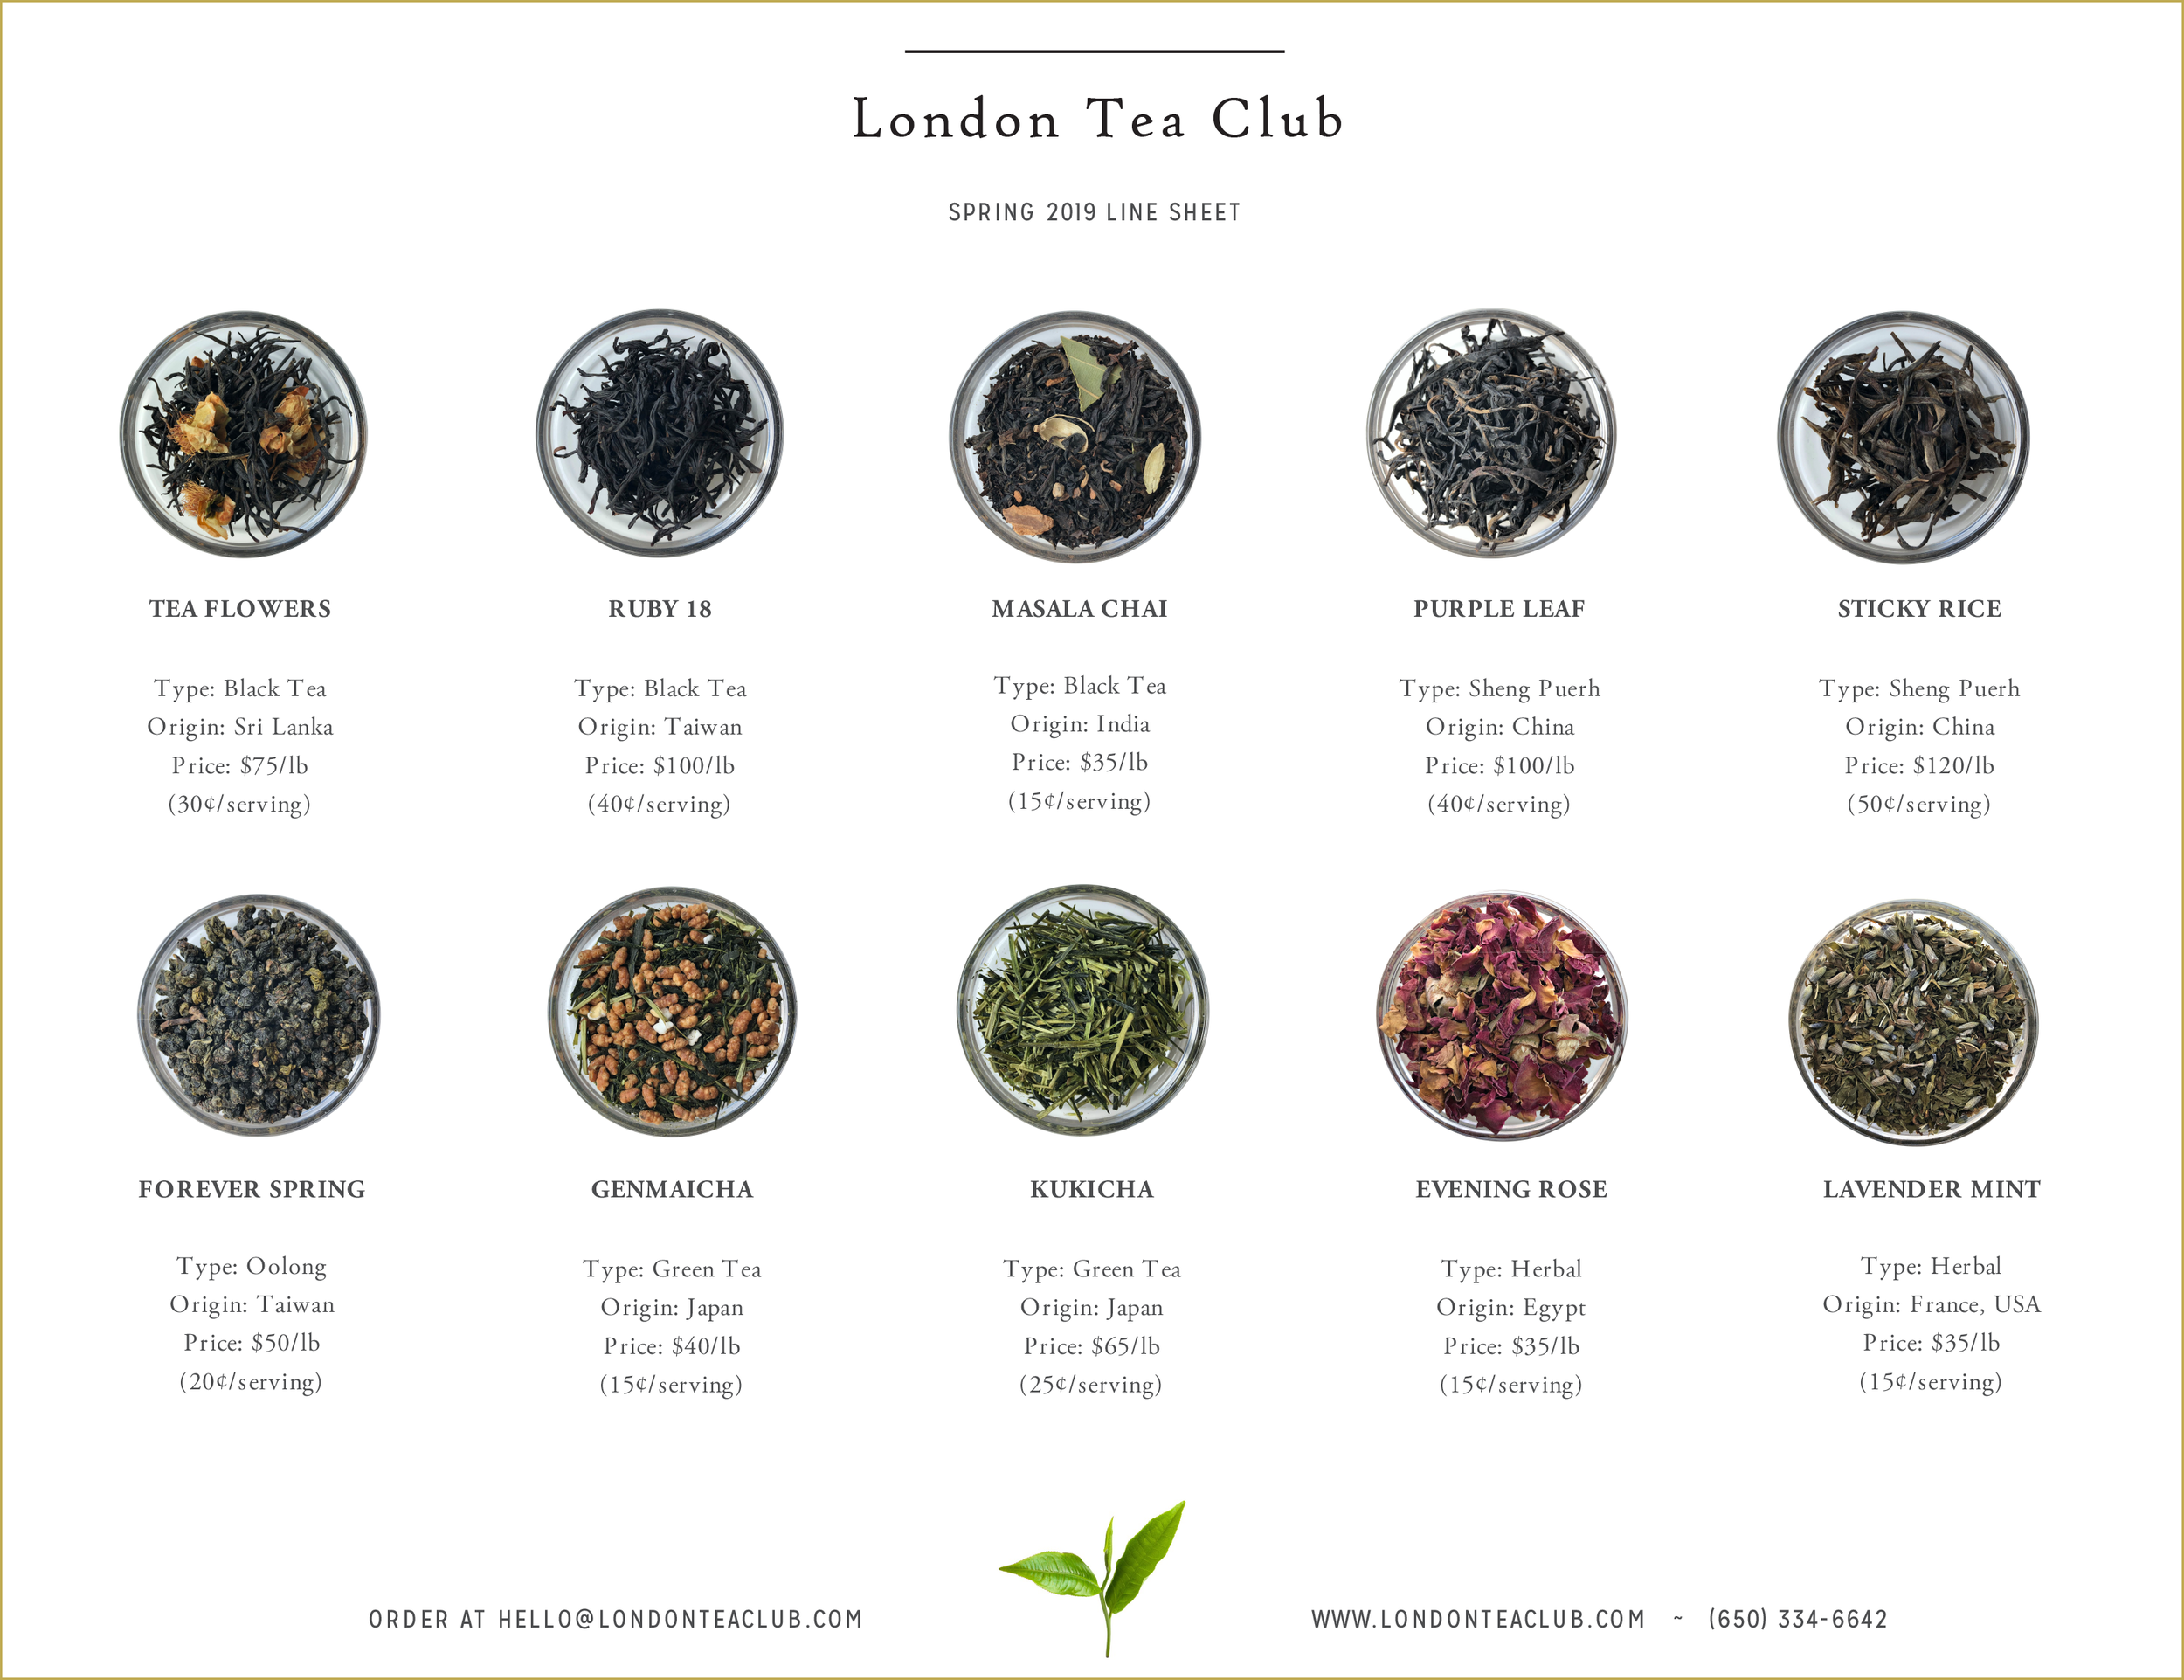 2019 London Tea Club Line Sheet.png